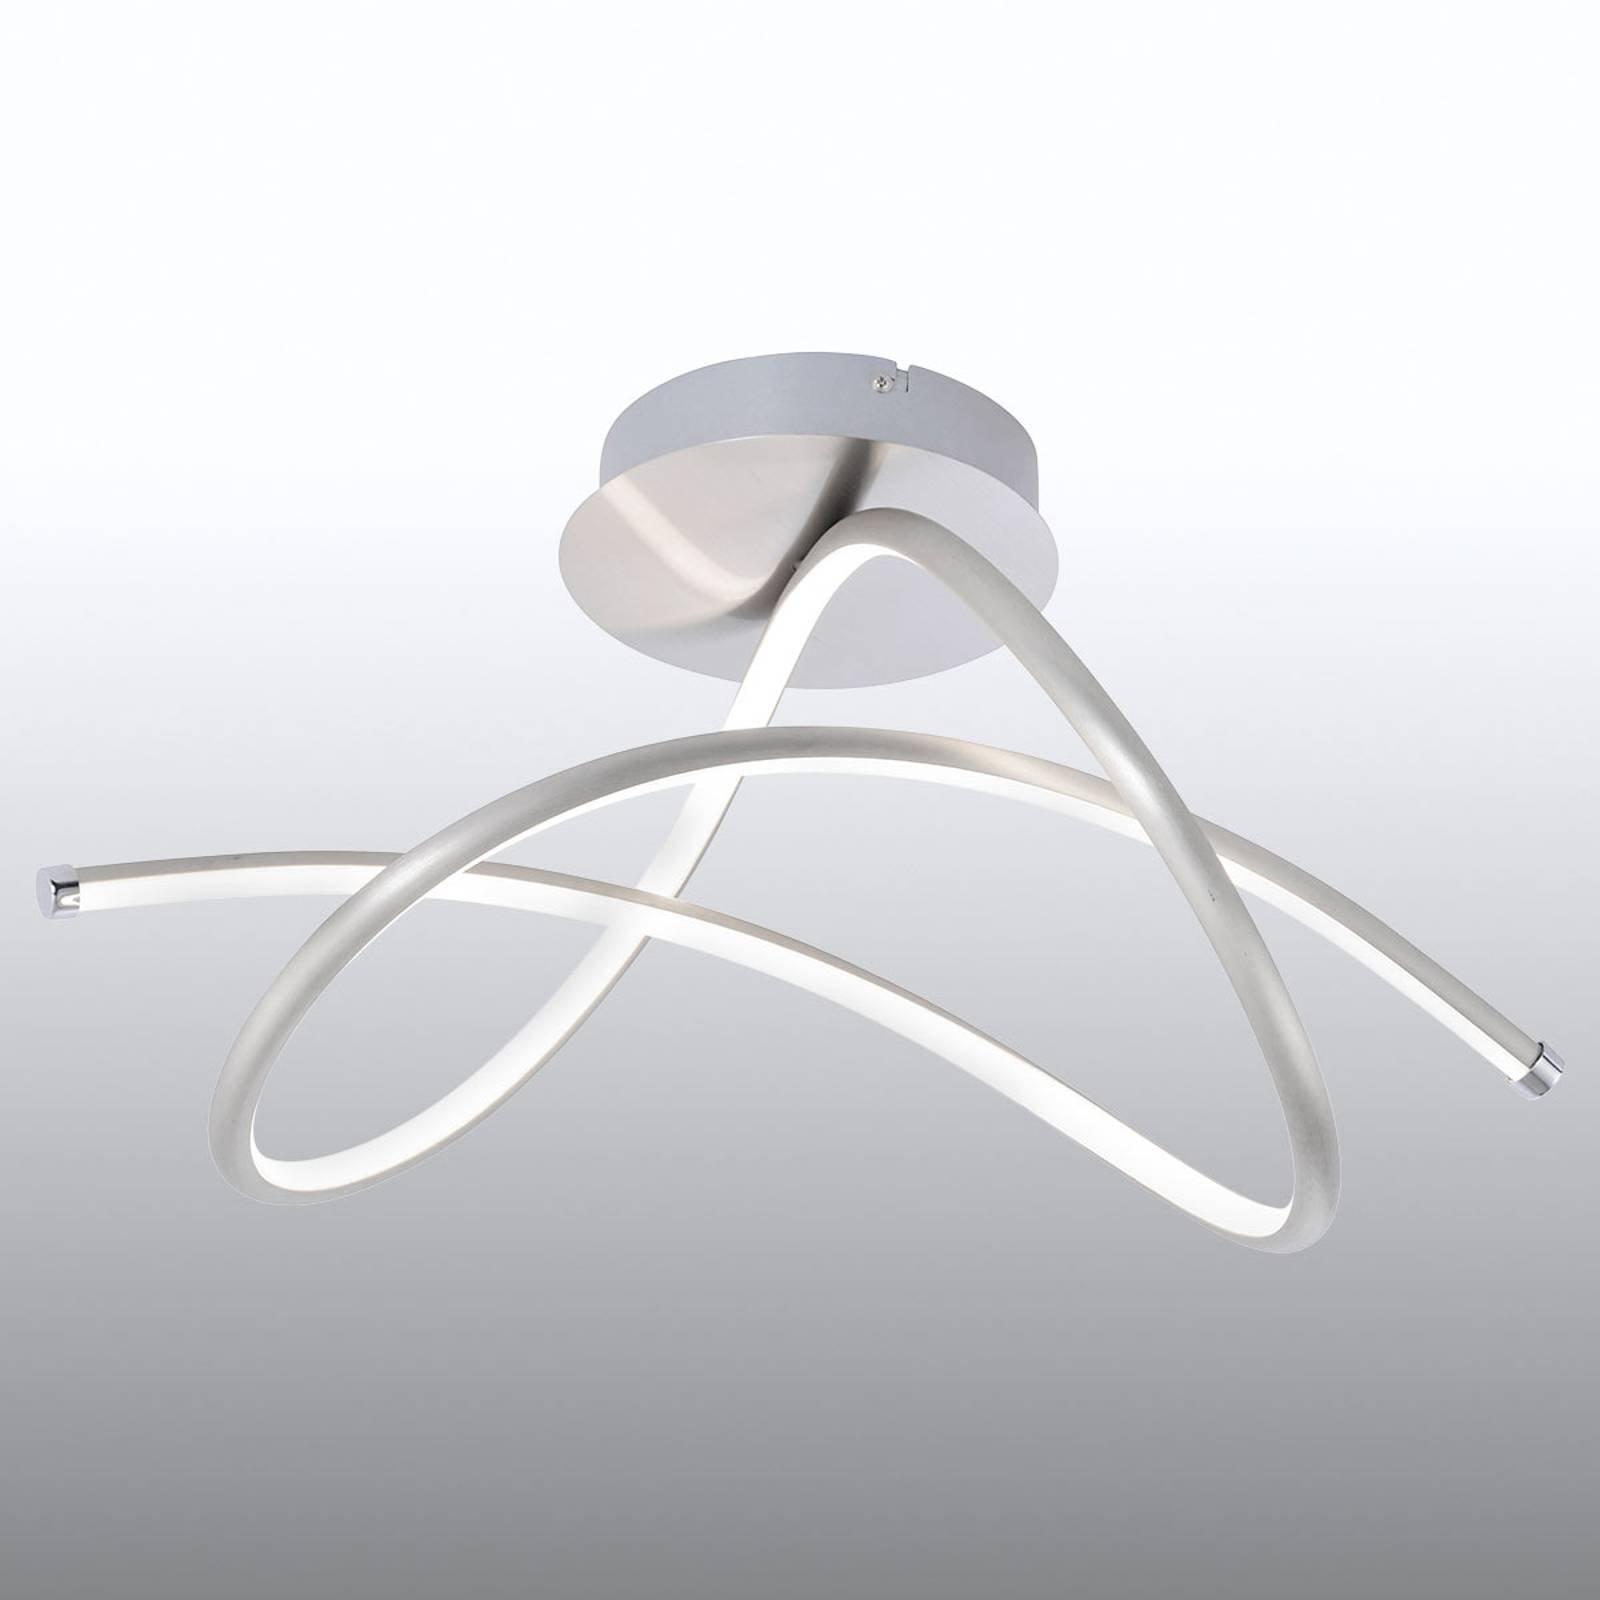 LED-taklampe Violetta, livfull, stål